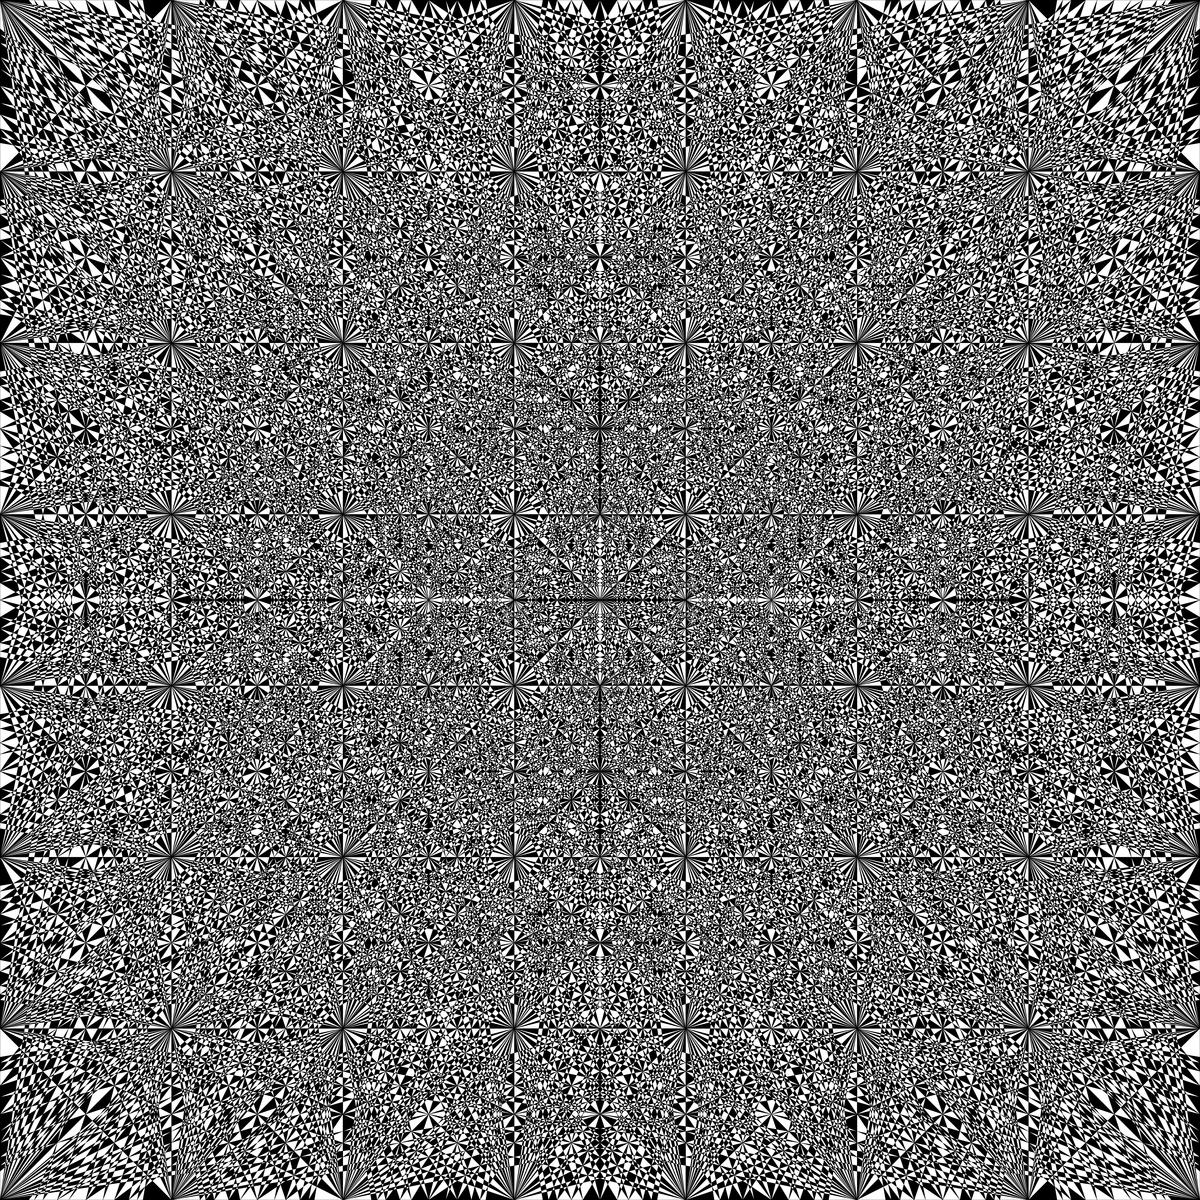 f:id:Hassium277:20200215195215p:plain